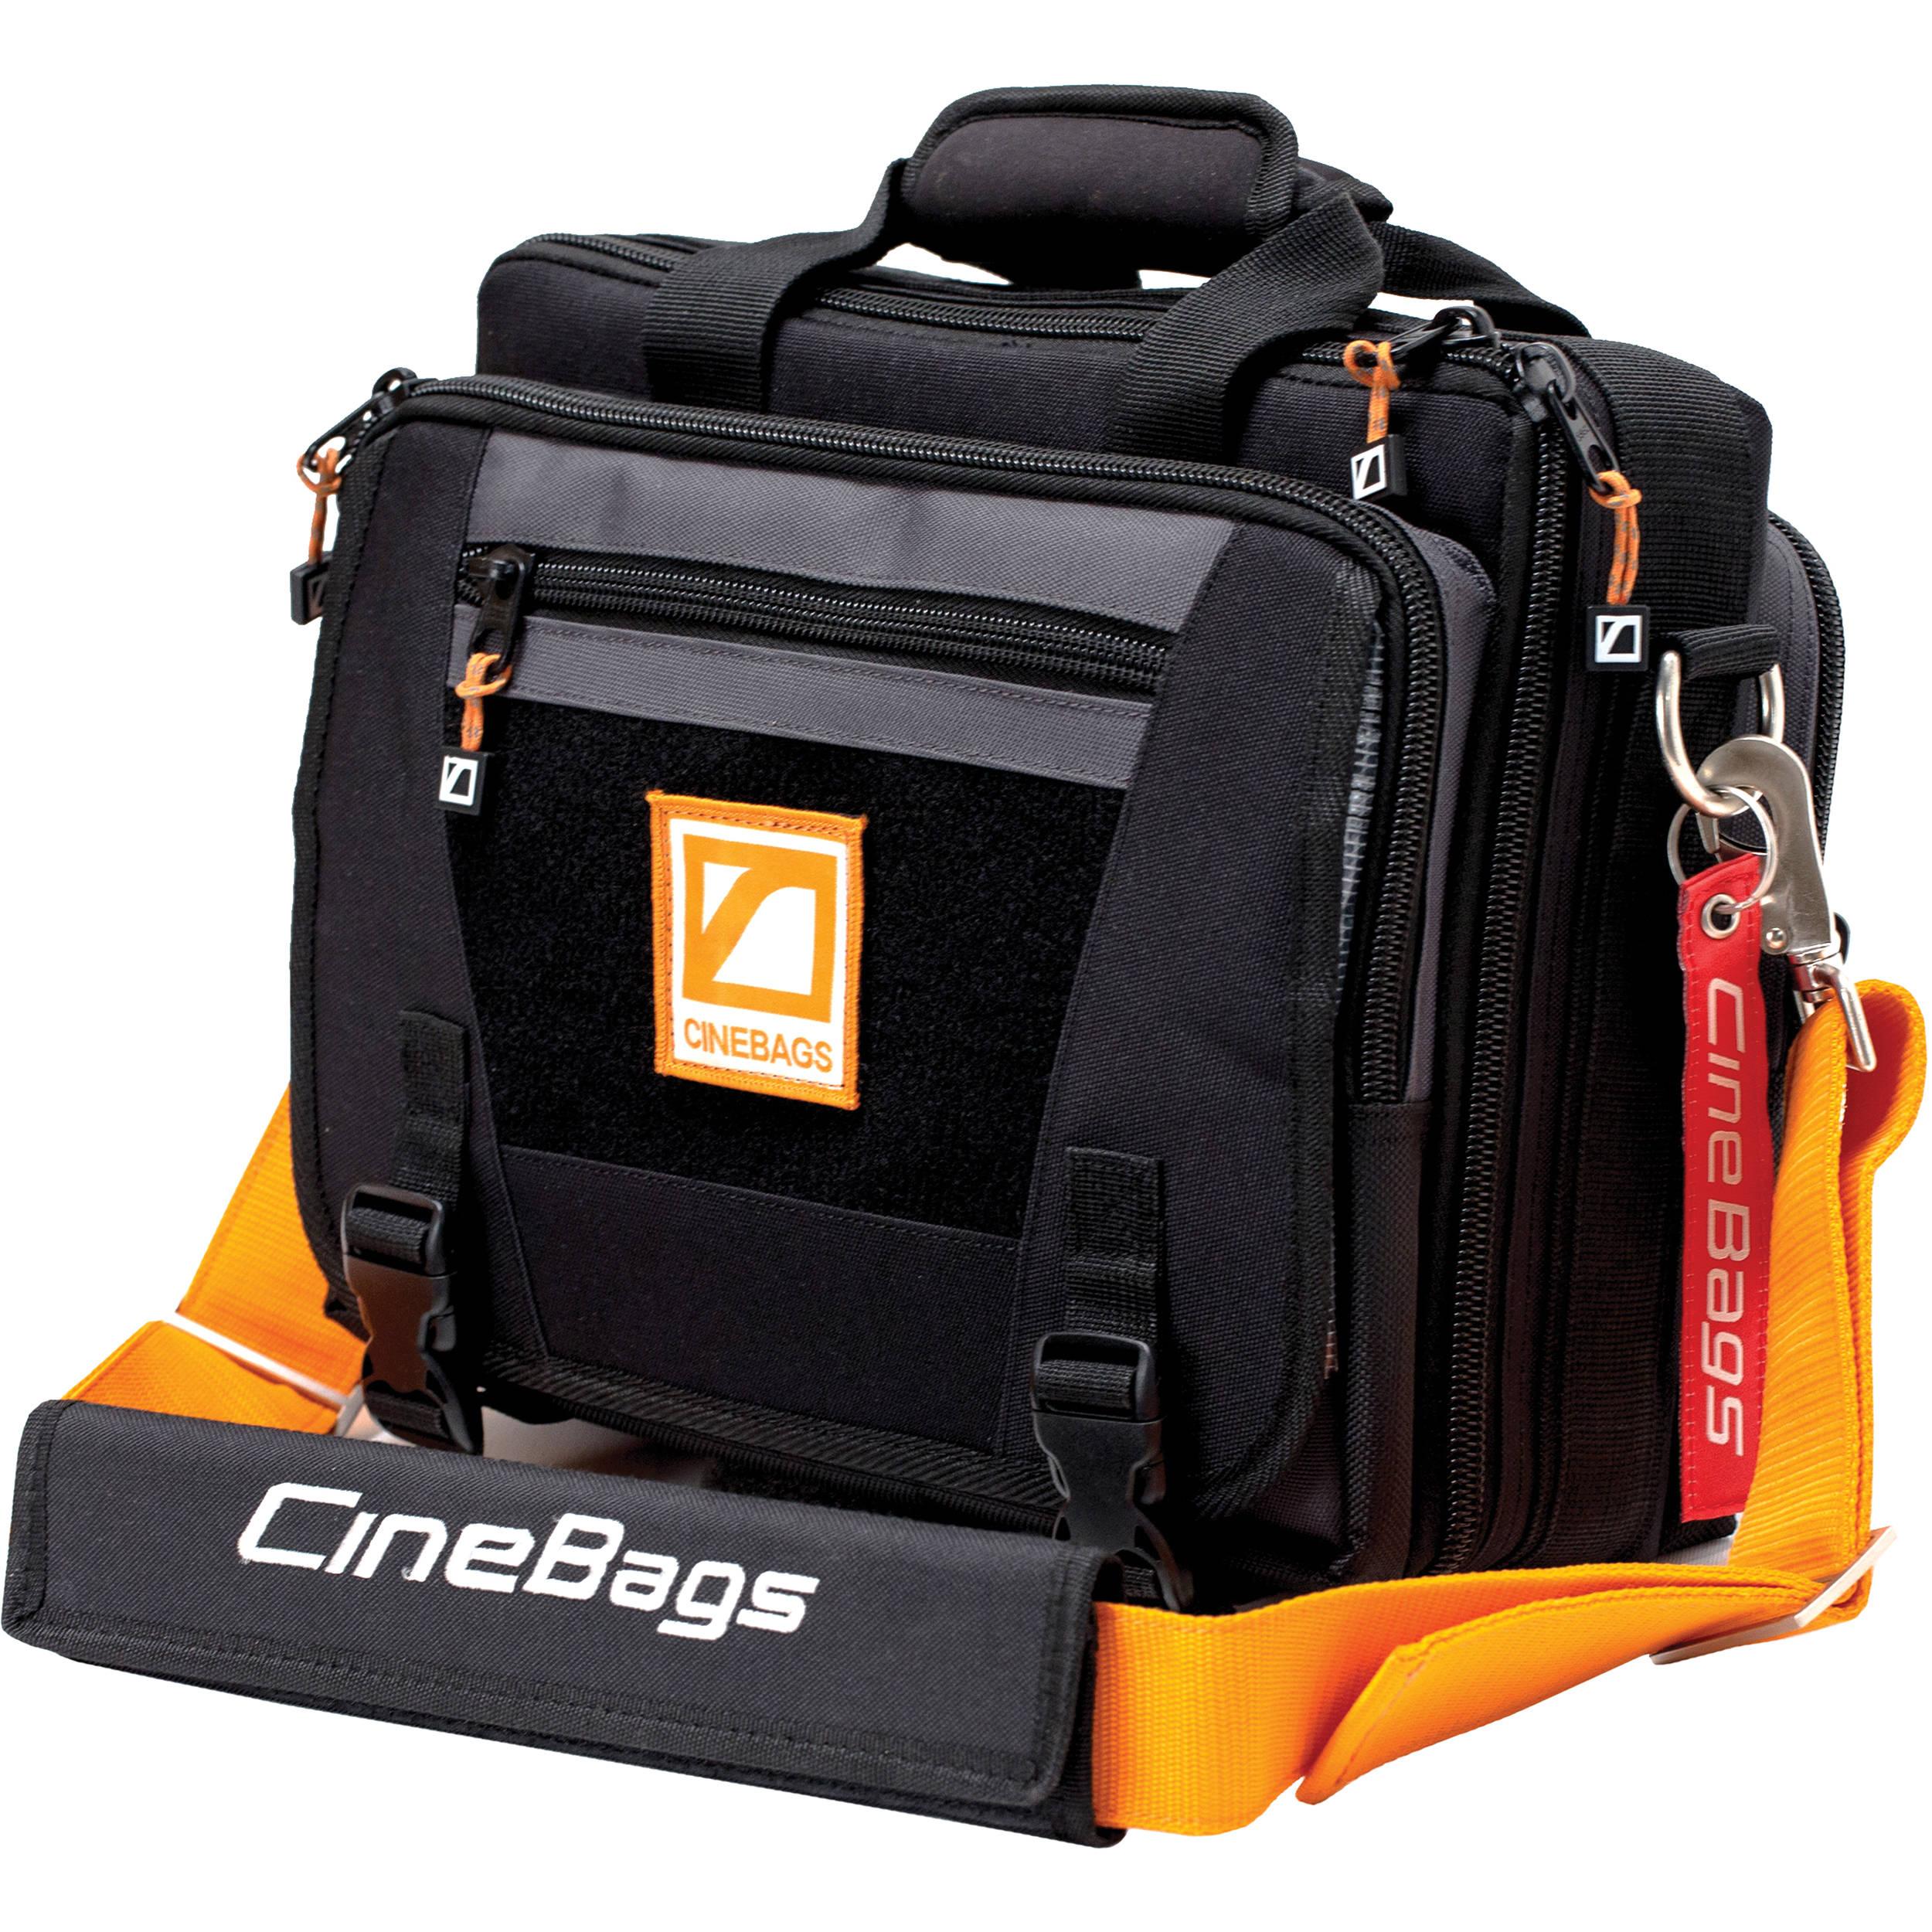 Cinebags Cb26 Gp Bunker Bag For Gopro Cameras Black Charcoal